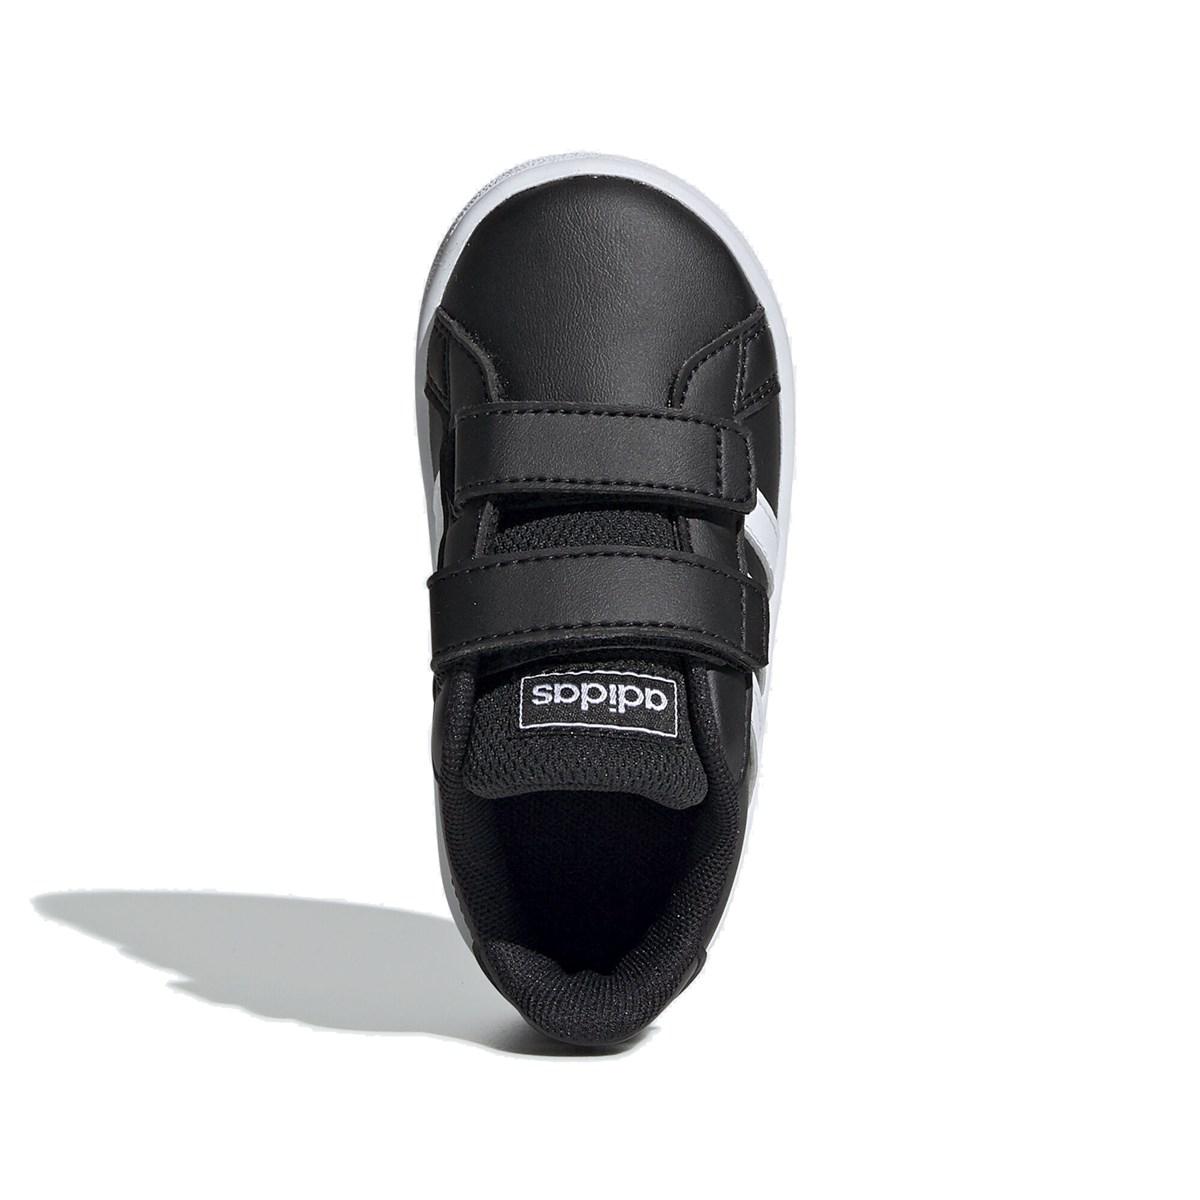 Grand Court I Çocuk Siyah Spor Ayakkabı (EF0117)